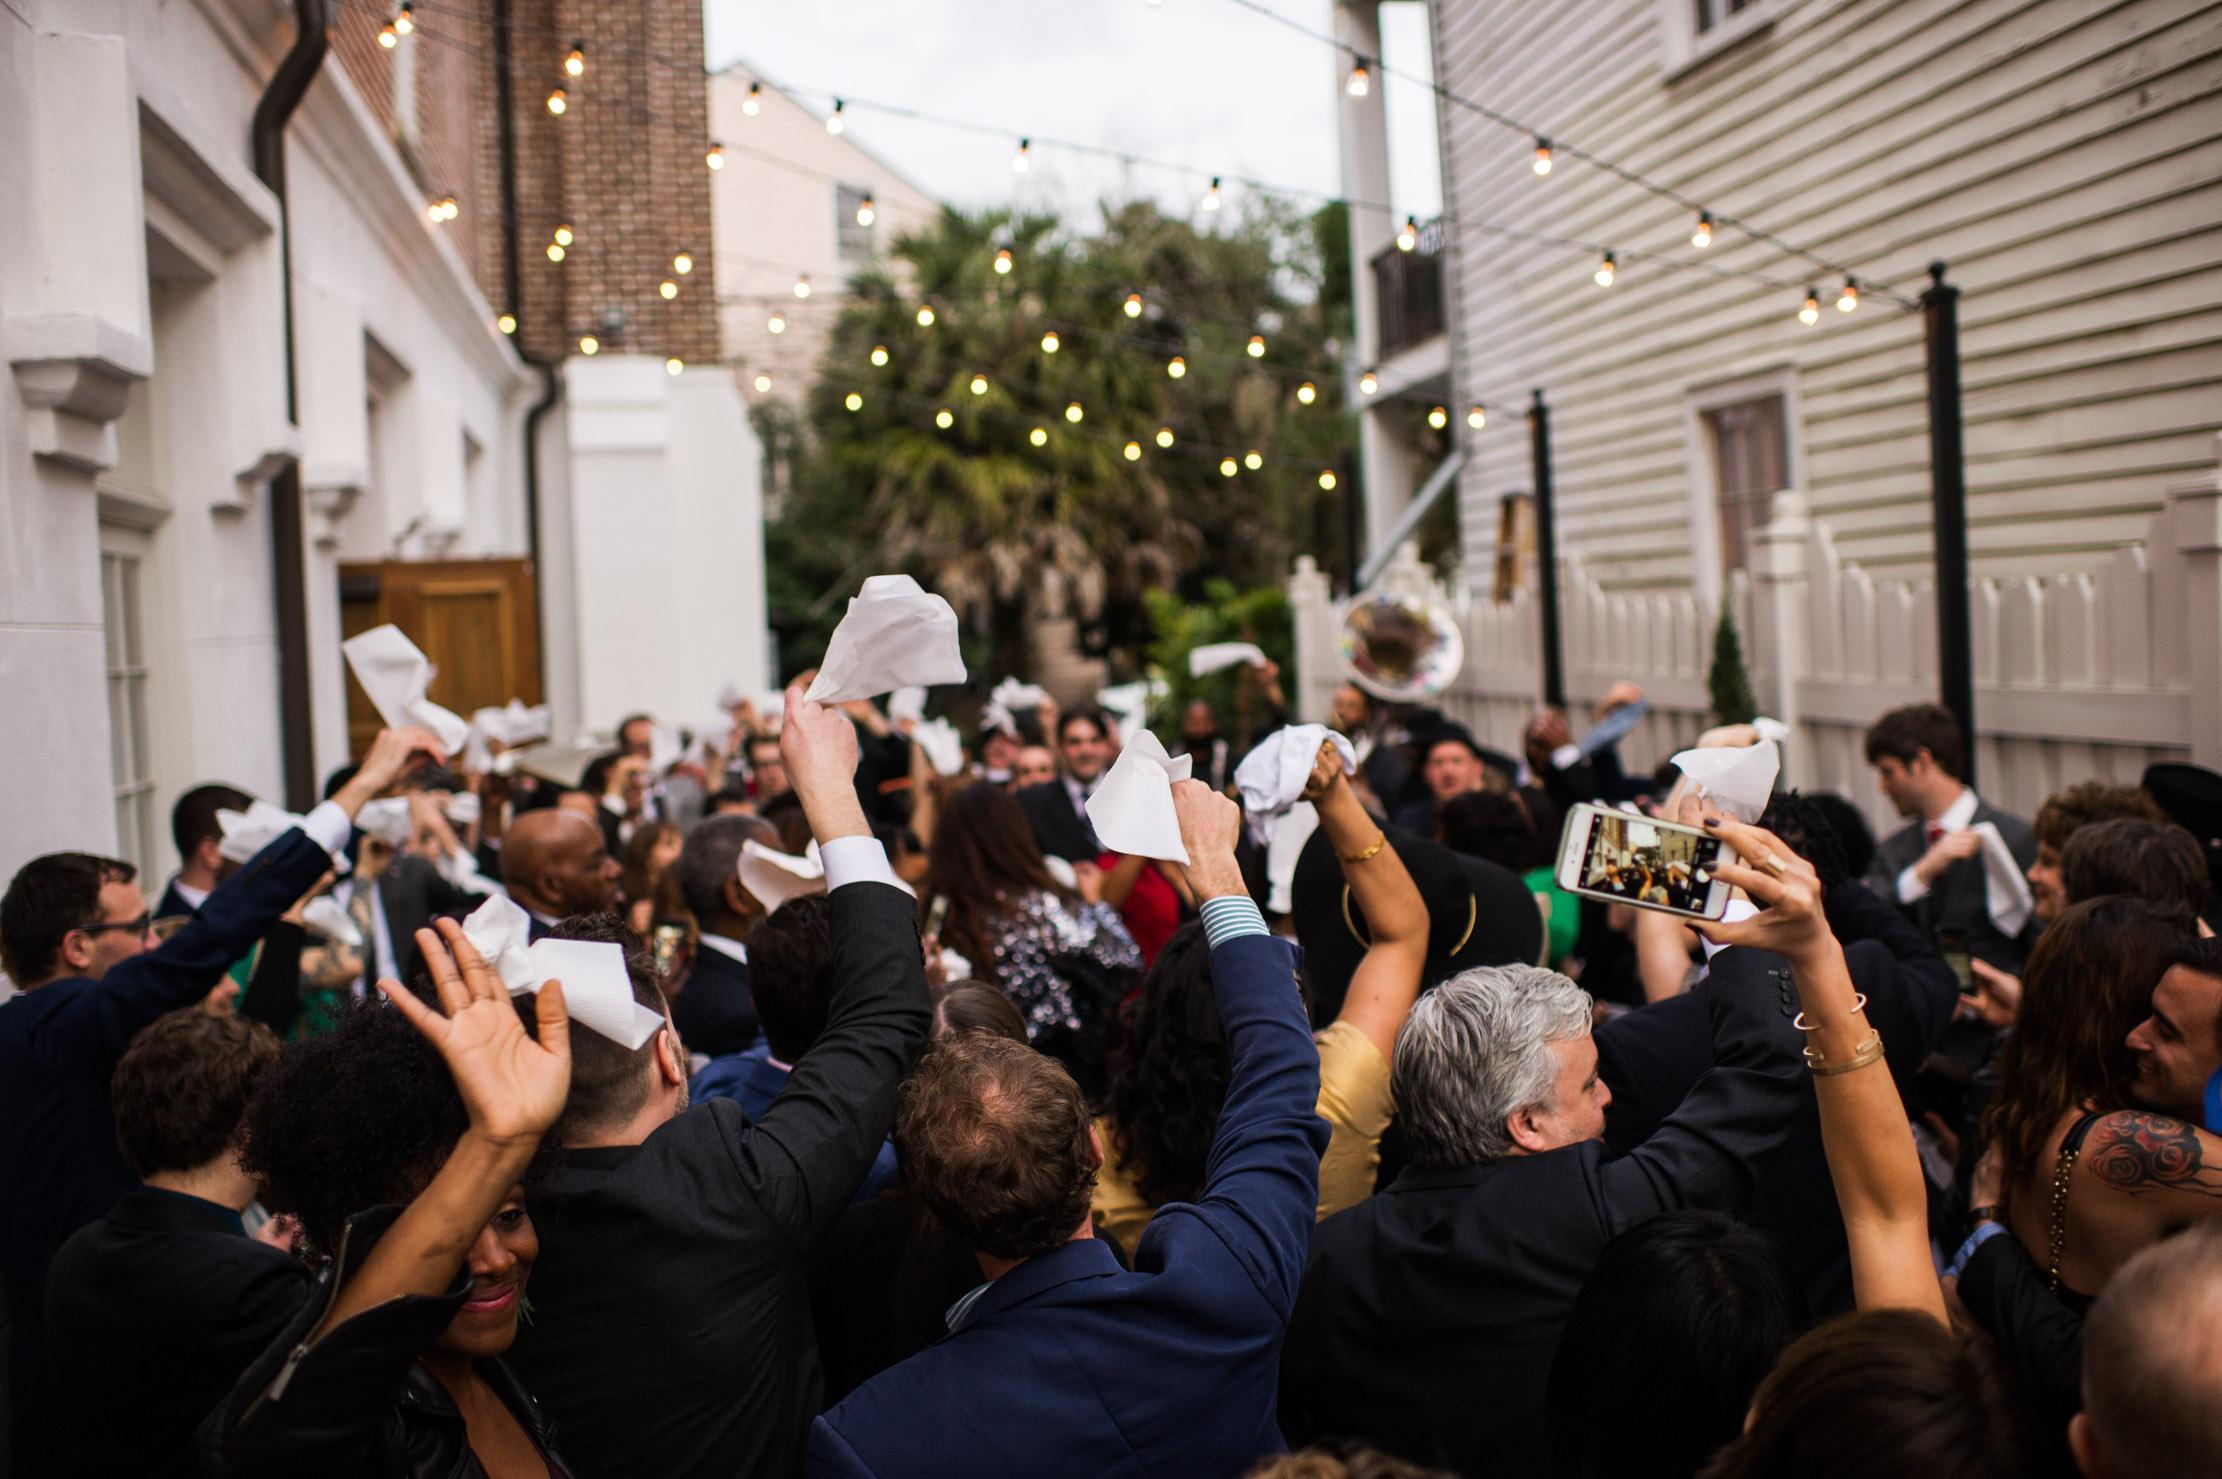 NOLA-Felicity-Church-Ace-Hotel-Wedding-1085.jpg